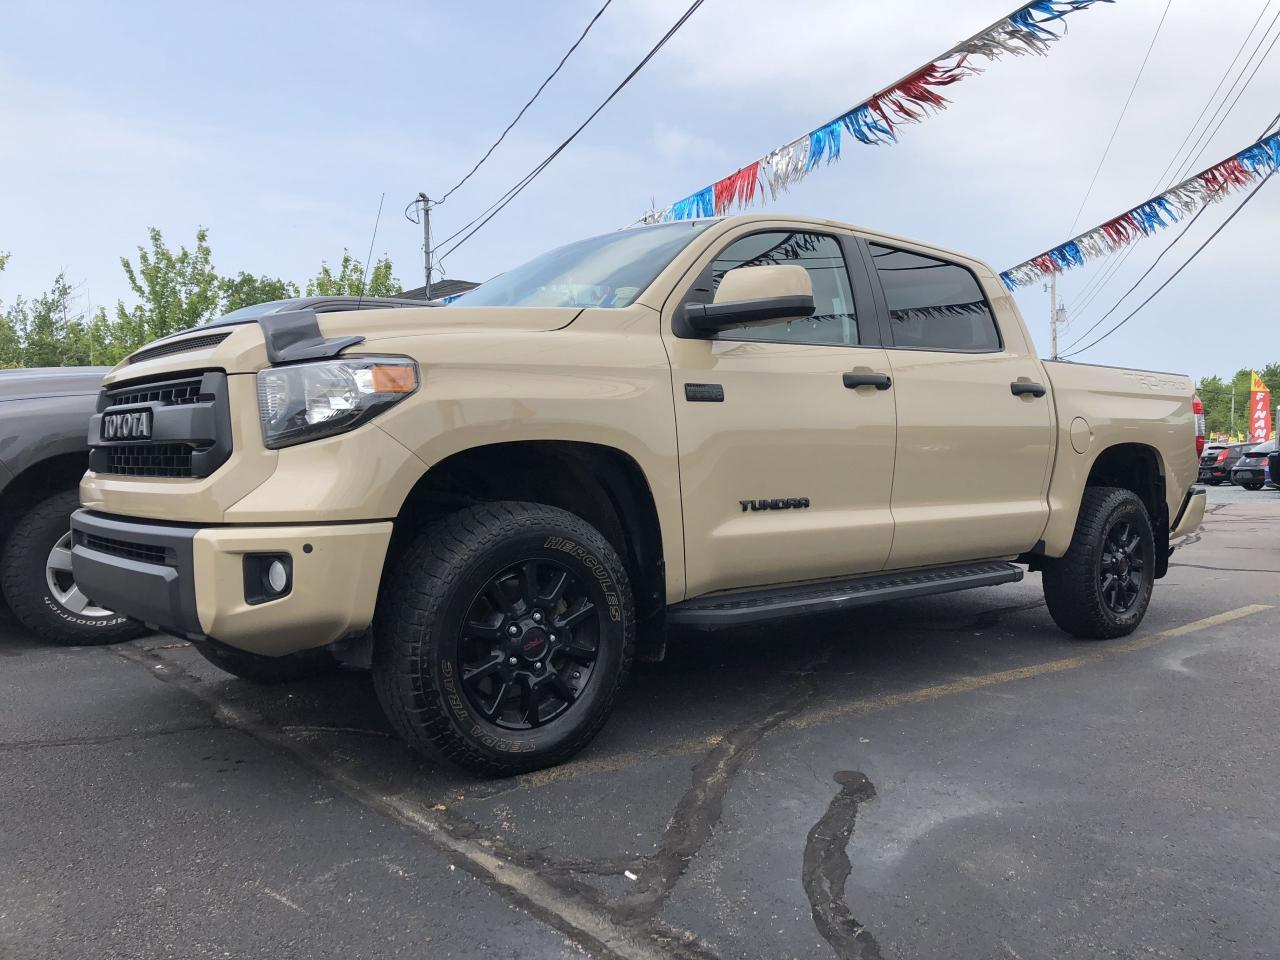 2016 Toyota Tundra Trd- OffRoad